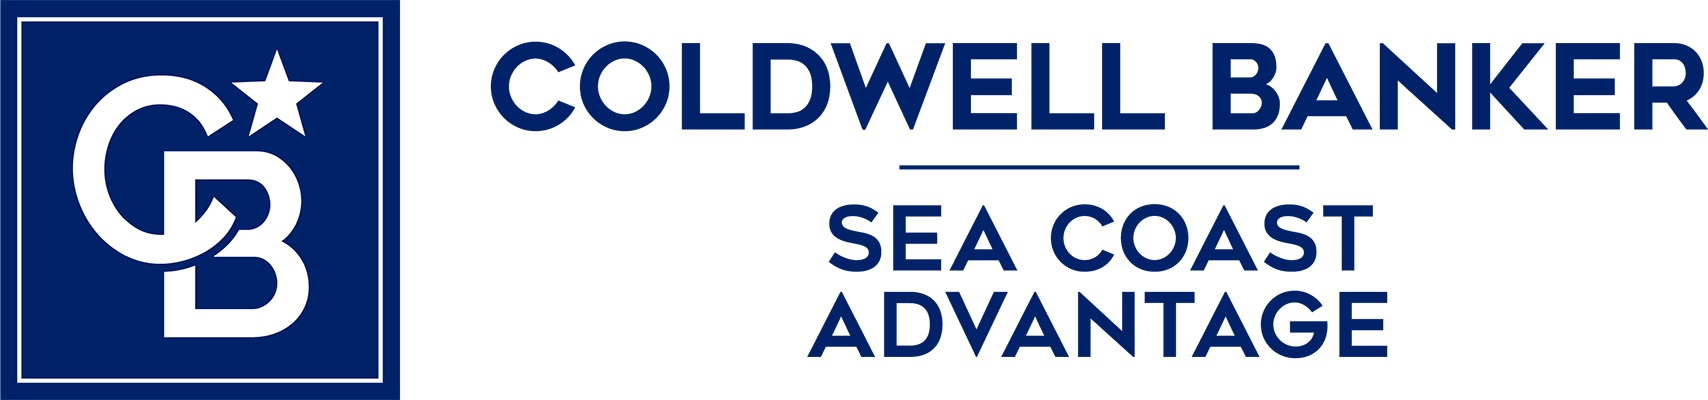 Rich Bove - Coldwell Banker Sea Coast Advantage Realty Logo